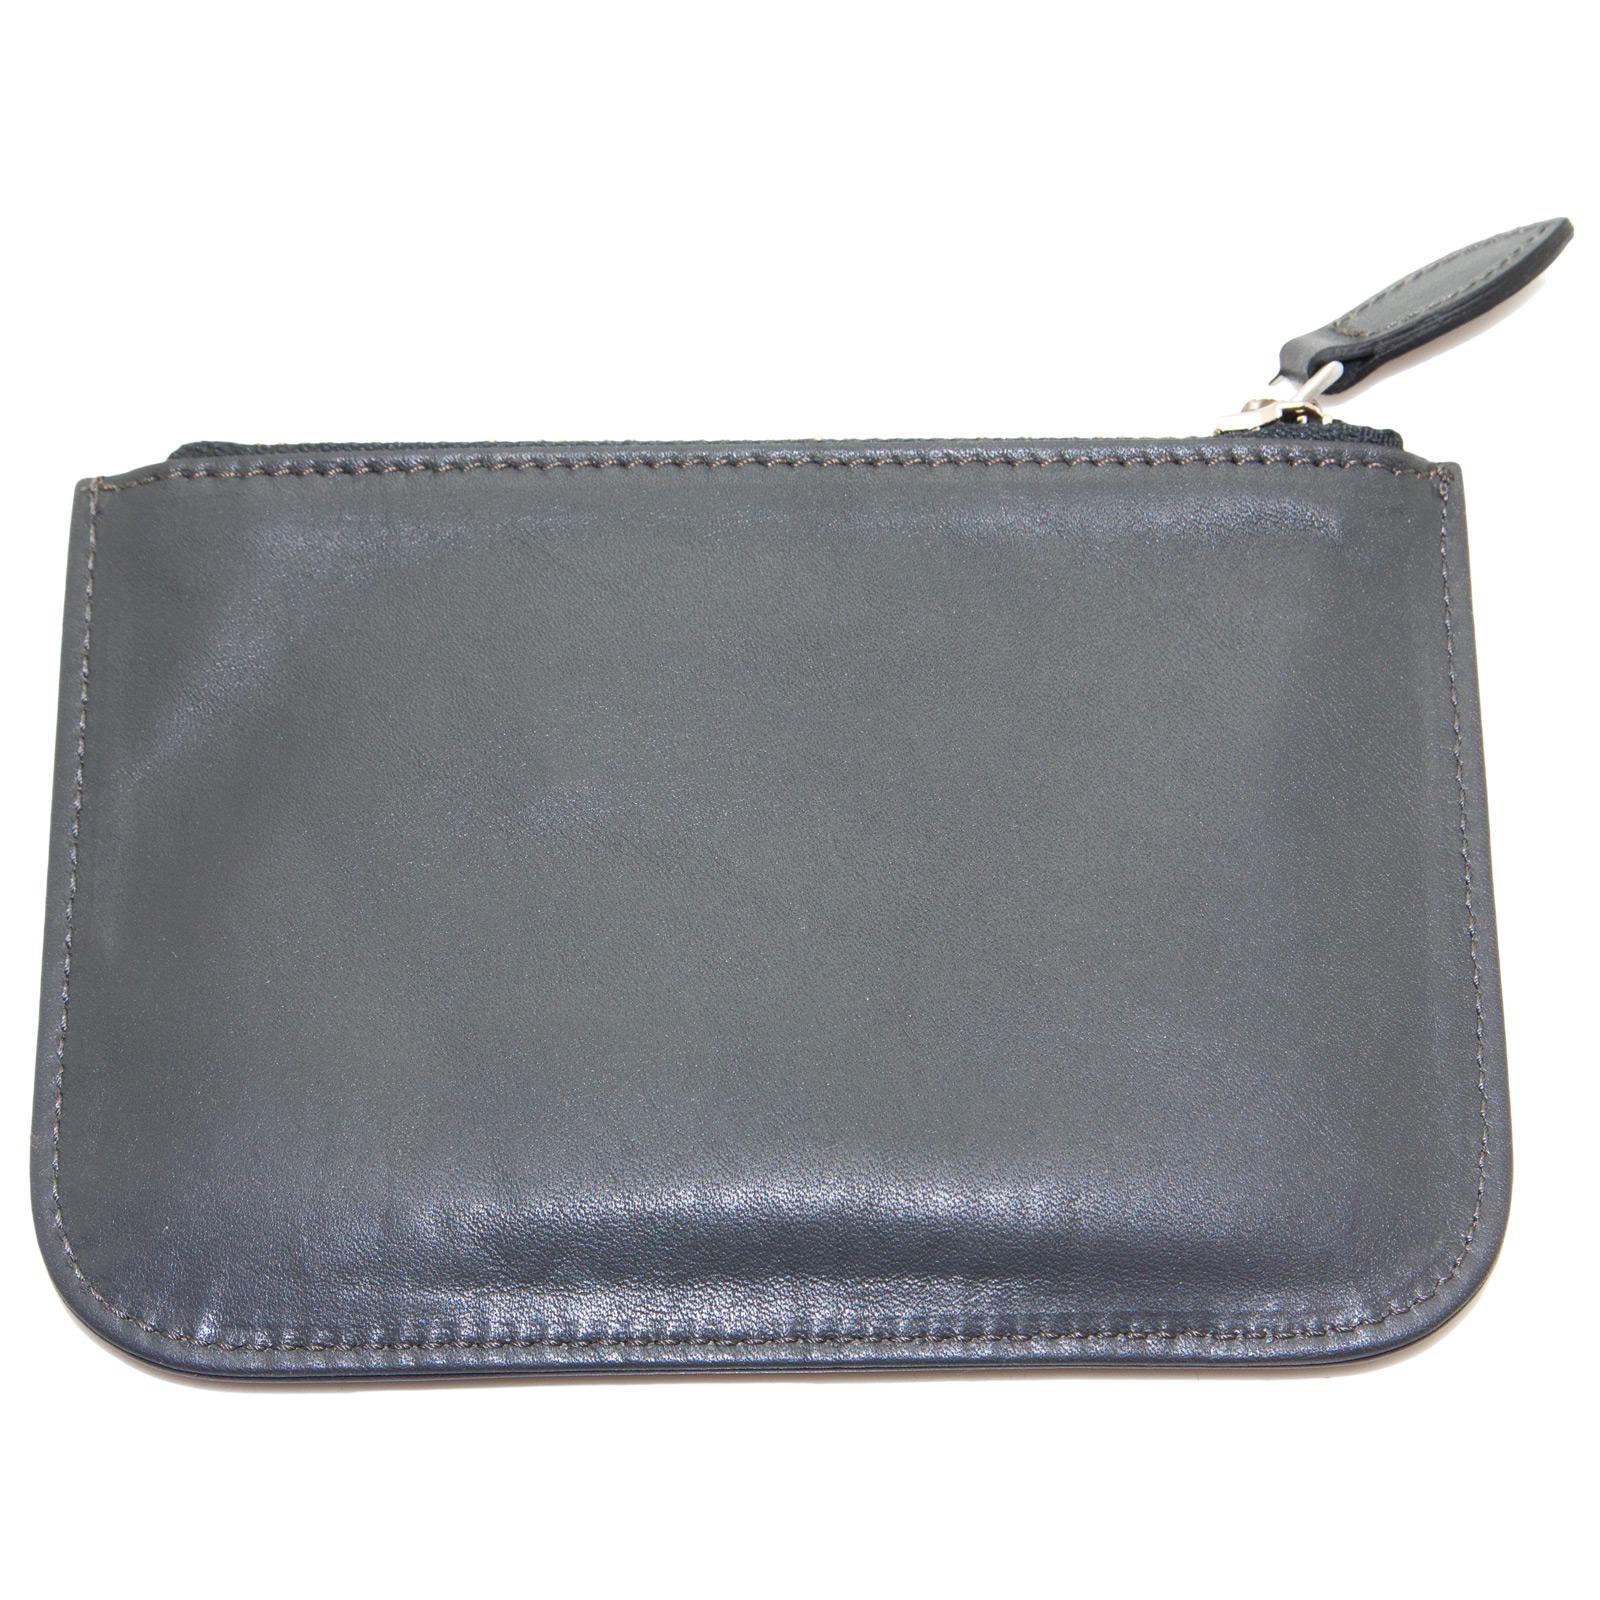 EMPORIO-ARMANI-Women-039-s-034-2012-034-Zip-Top-Coin-Purse-Wallet-YEMG99-195-NWT thumbnail 6